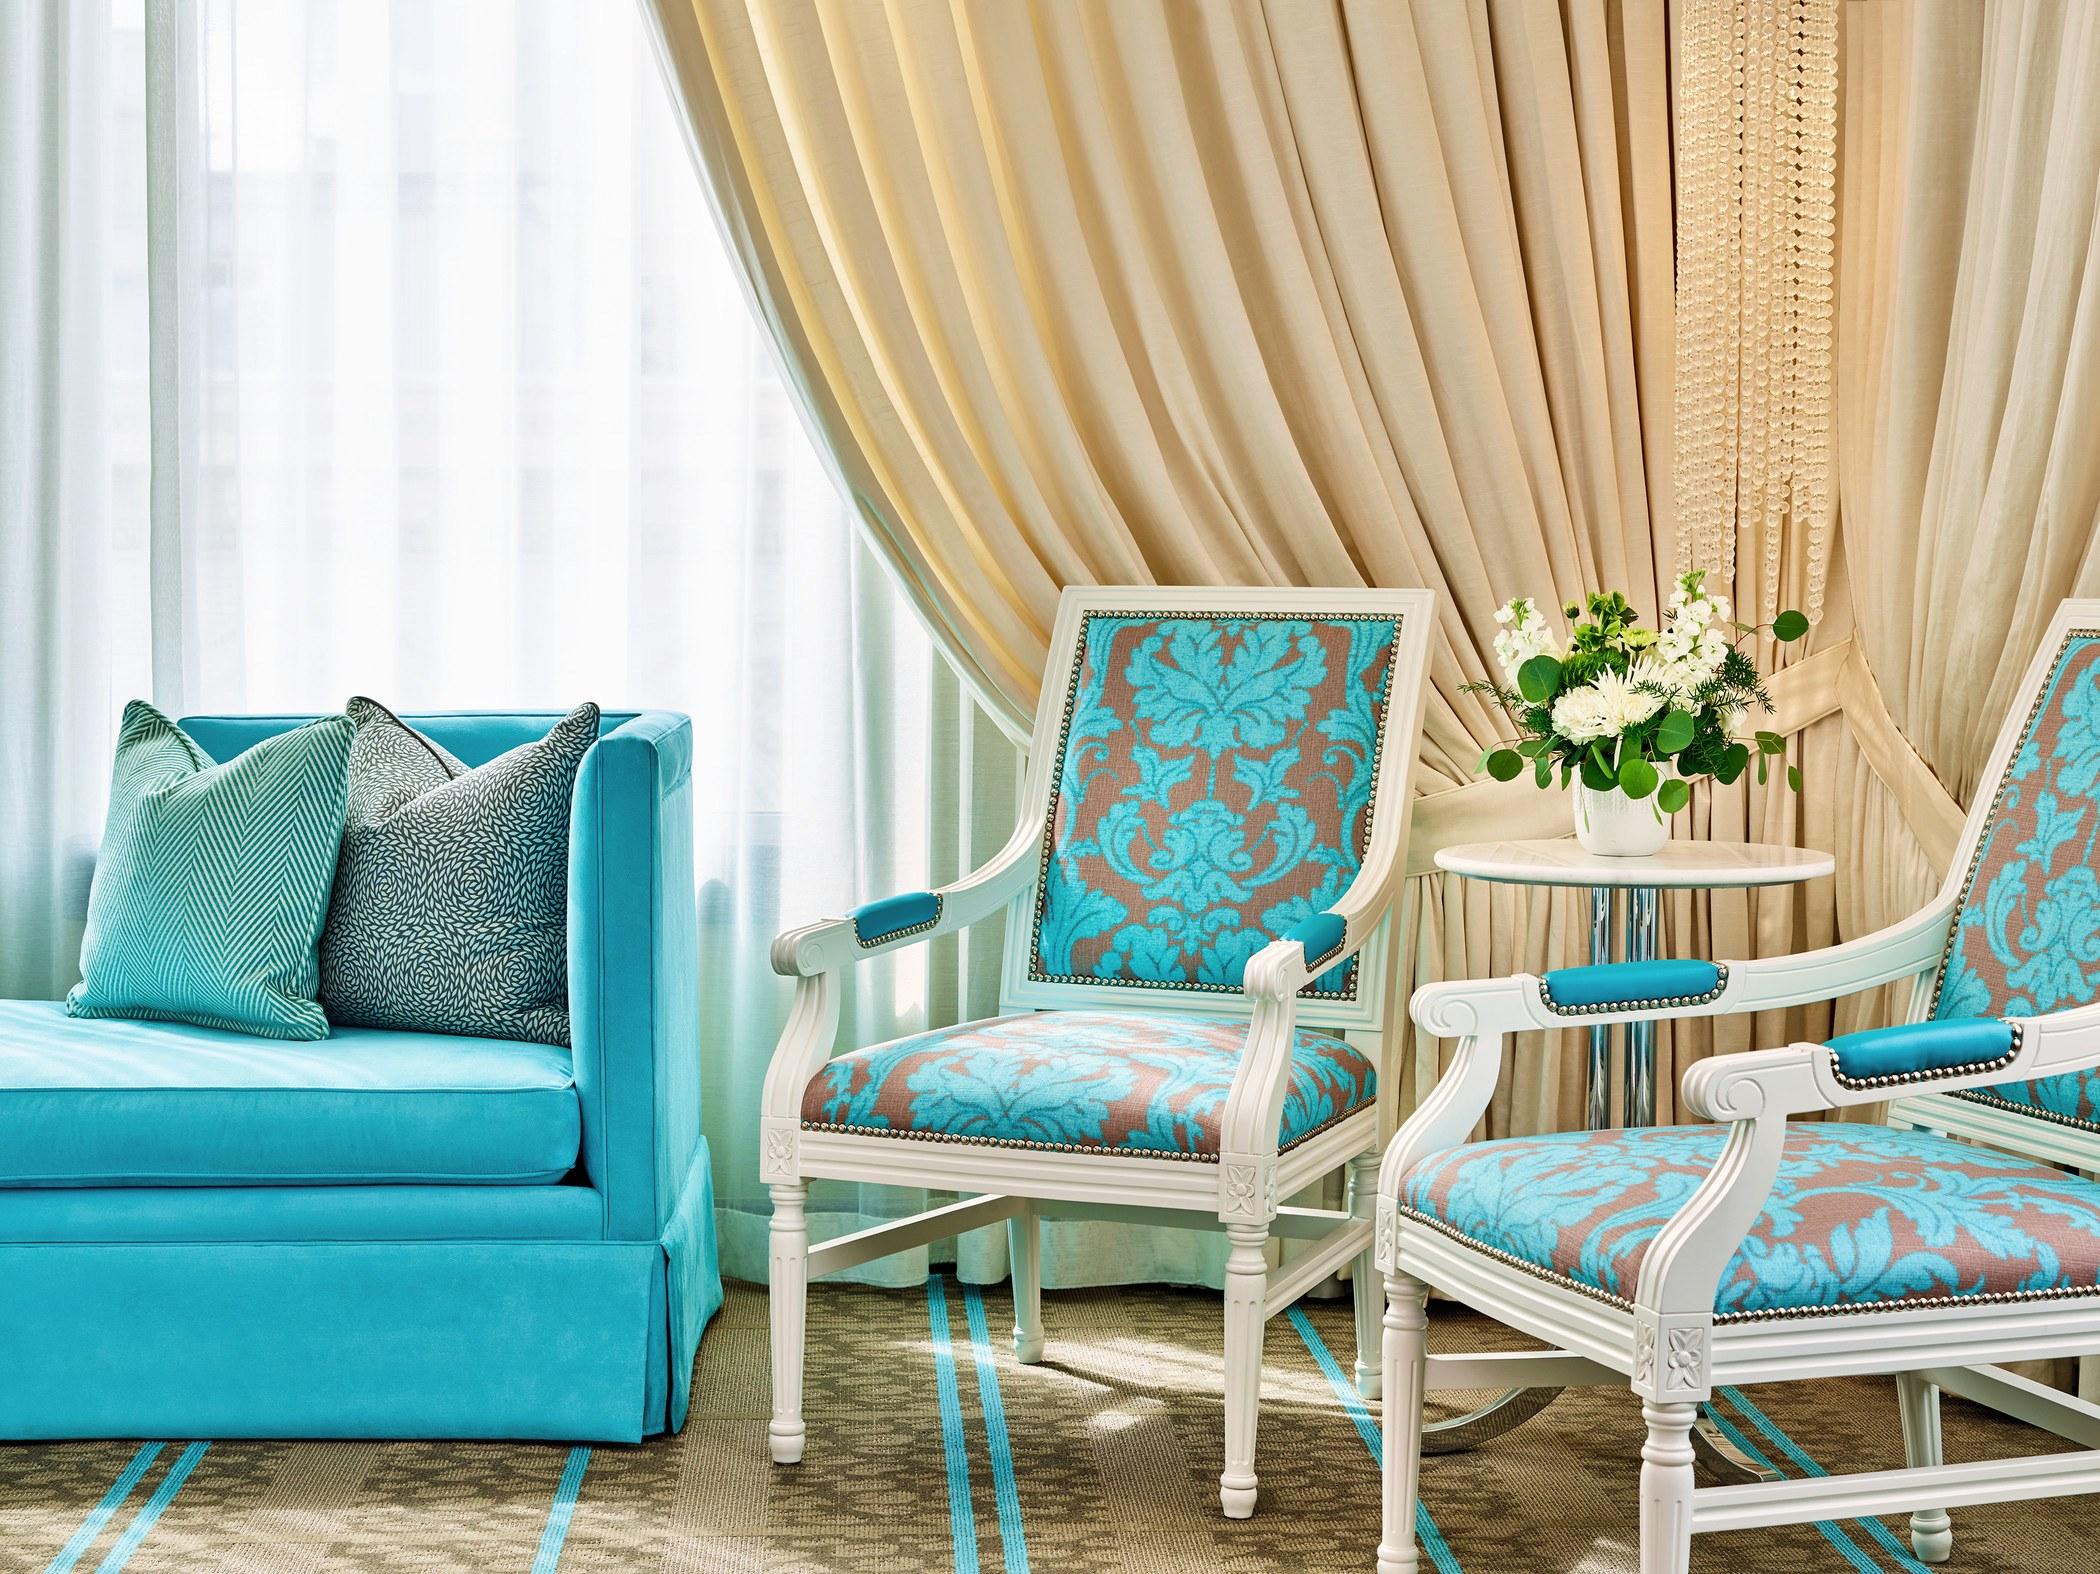 Luxury Hotel Room in Portland - Explore Superior Room | The Nines Hotel